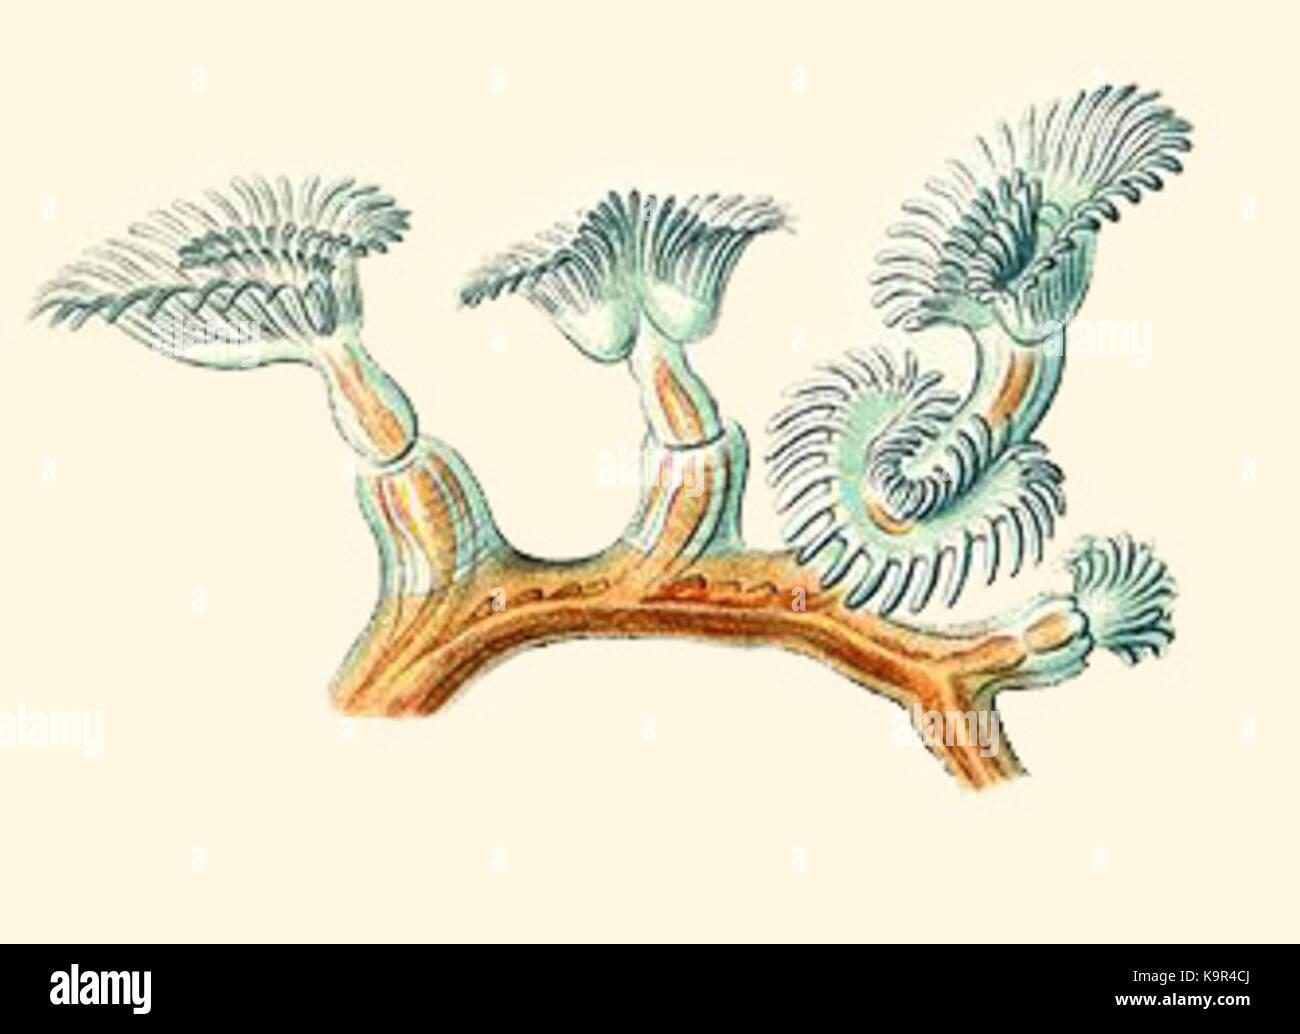 Plumatella repens from Haeckel Bryozoa drawing Commons2 Stock Photo